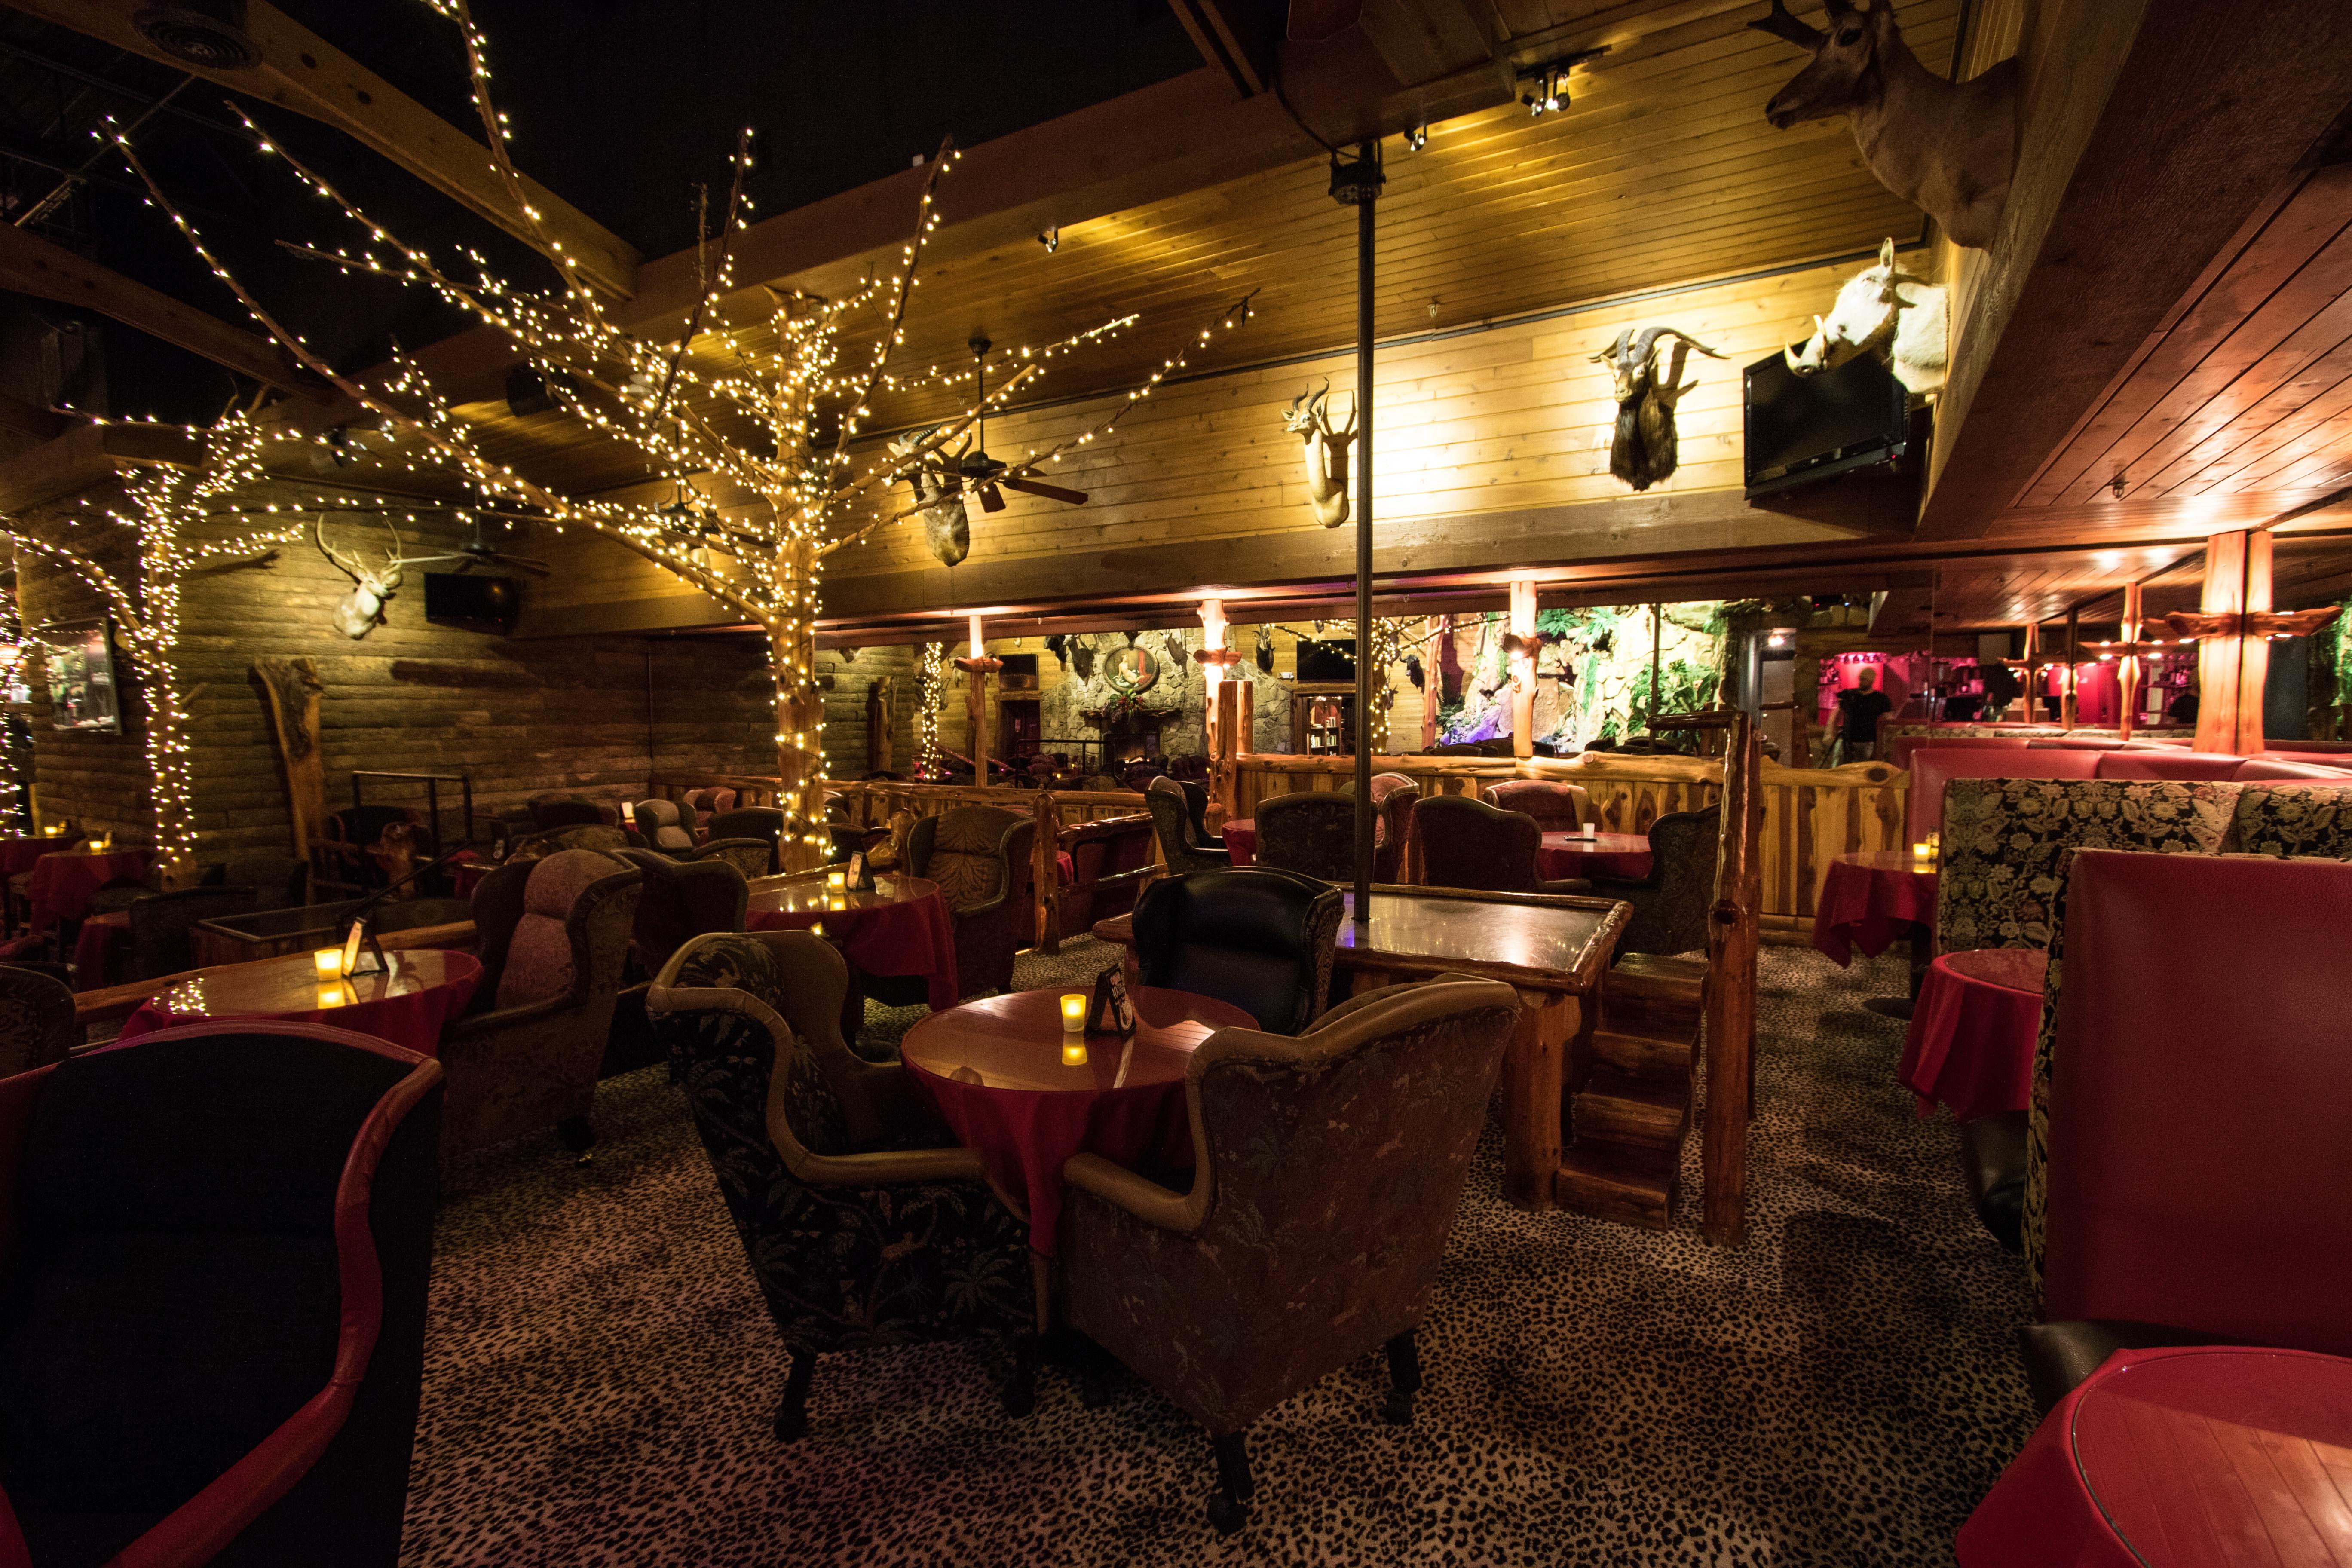 The Lodge Main Room Bar